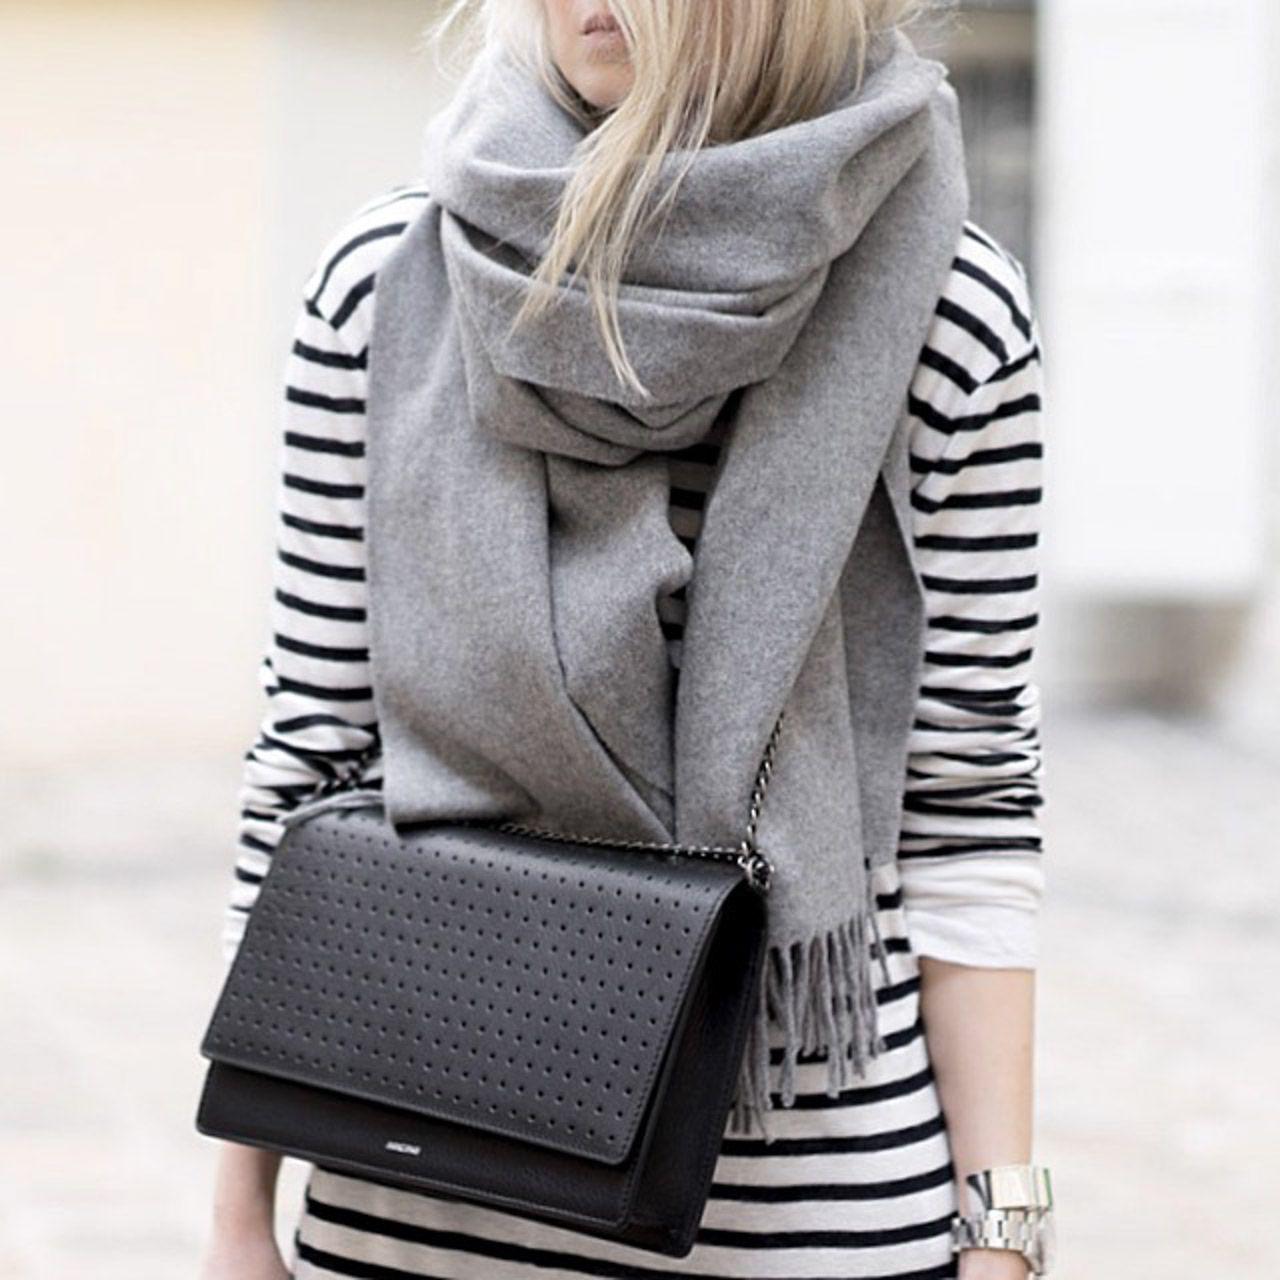 Tips On How To Wear anine bing bags, Anine Bing